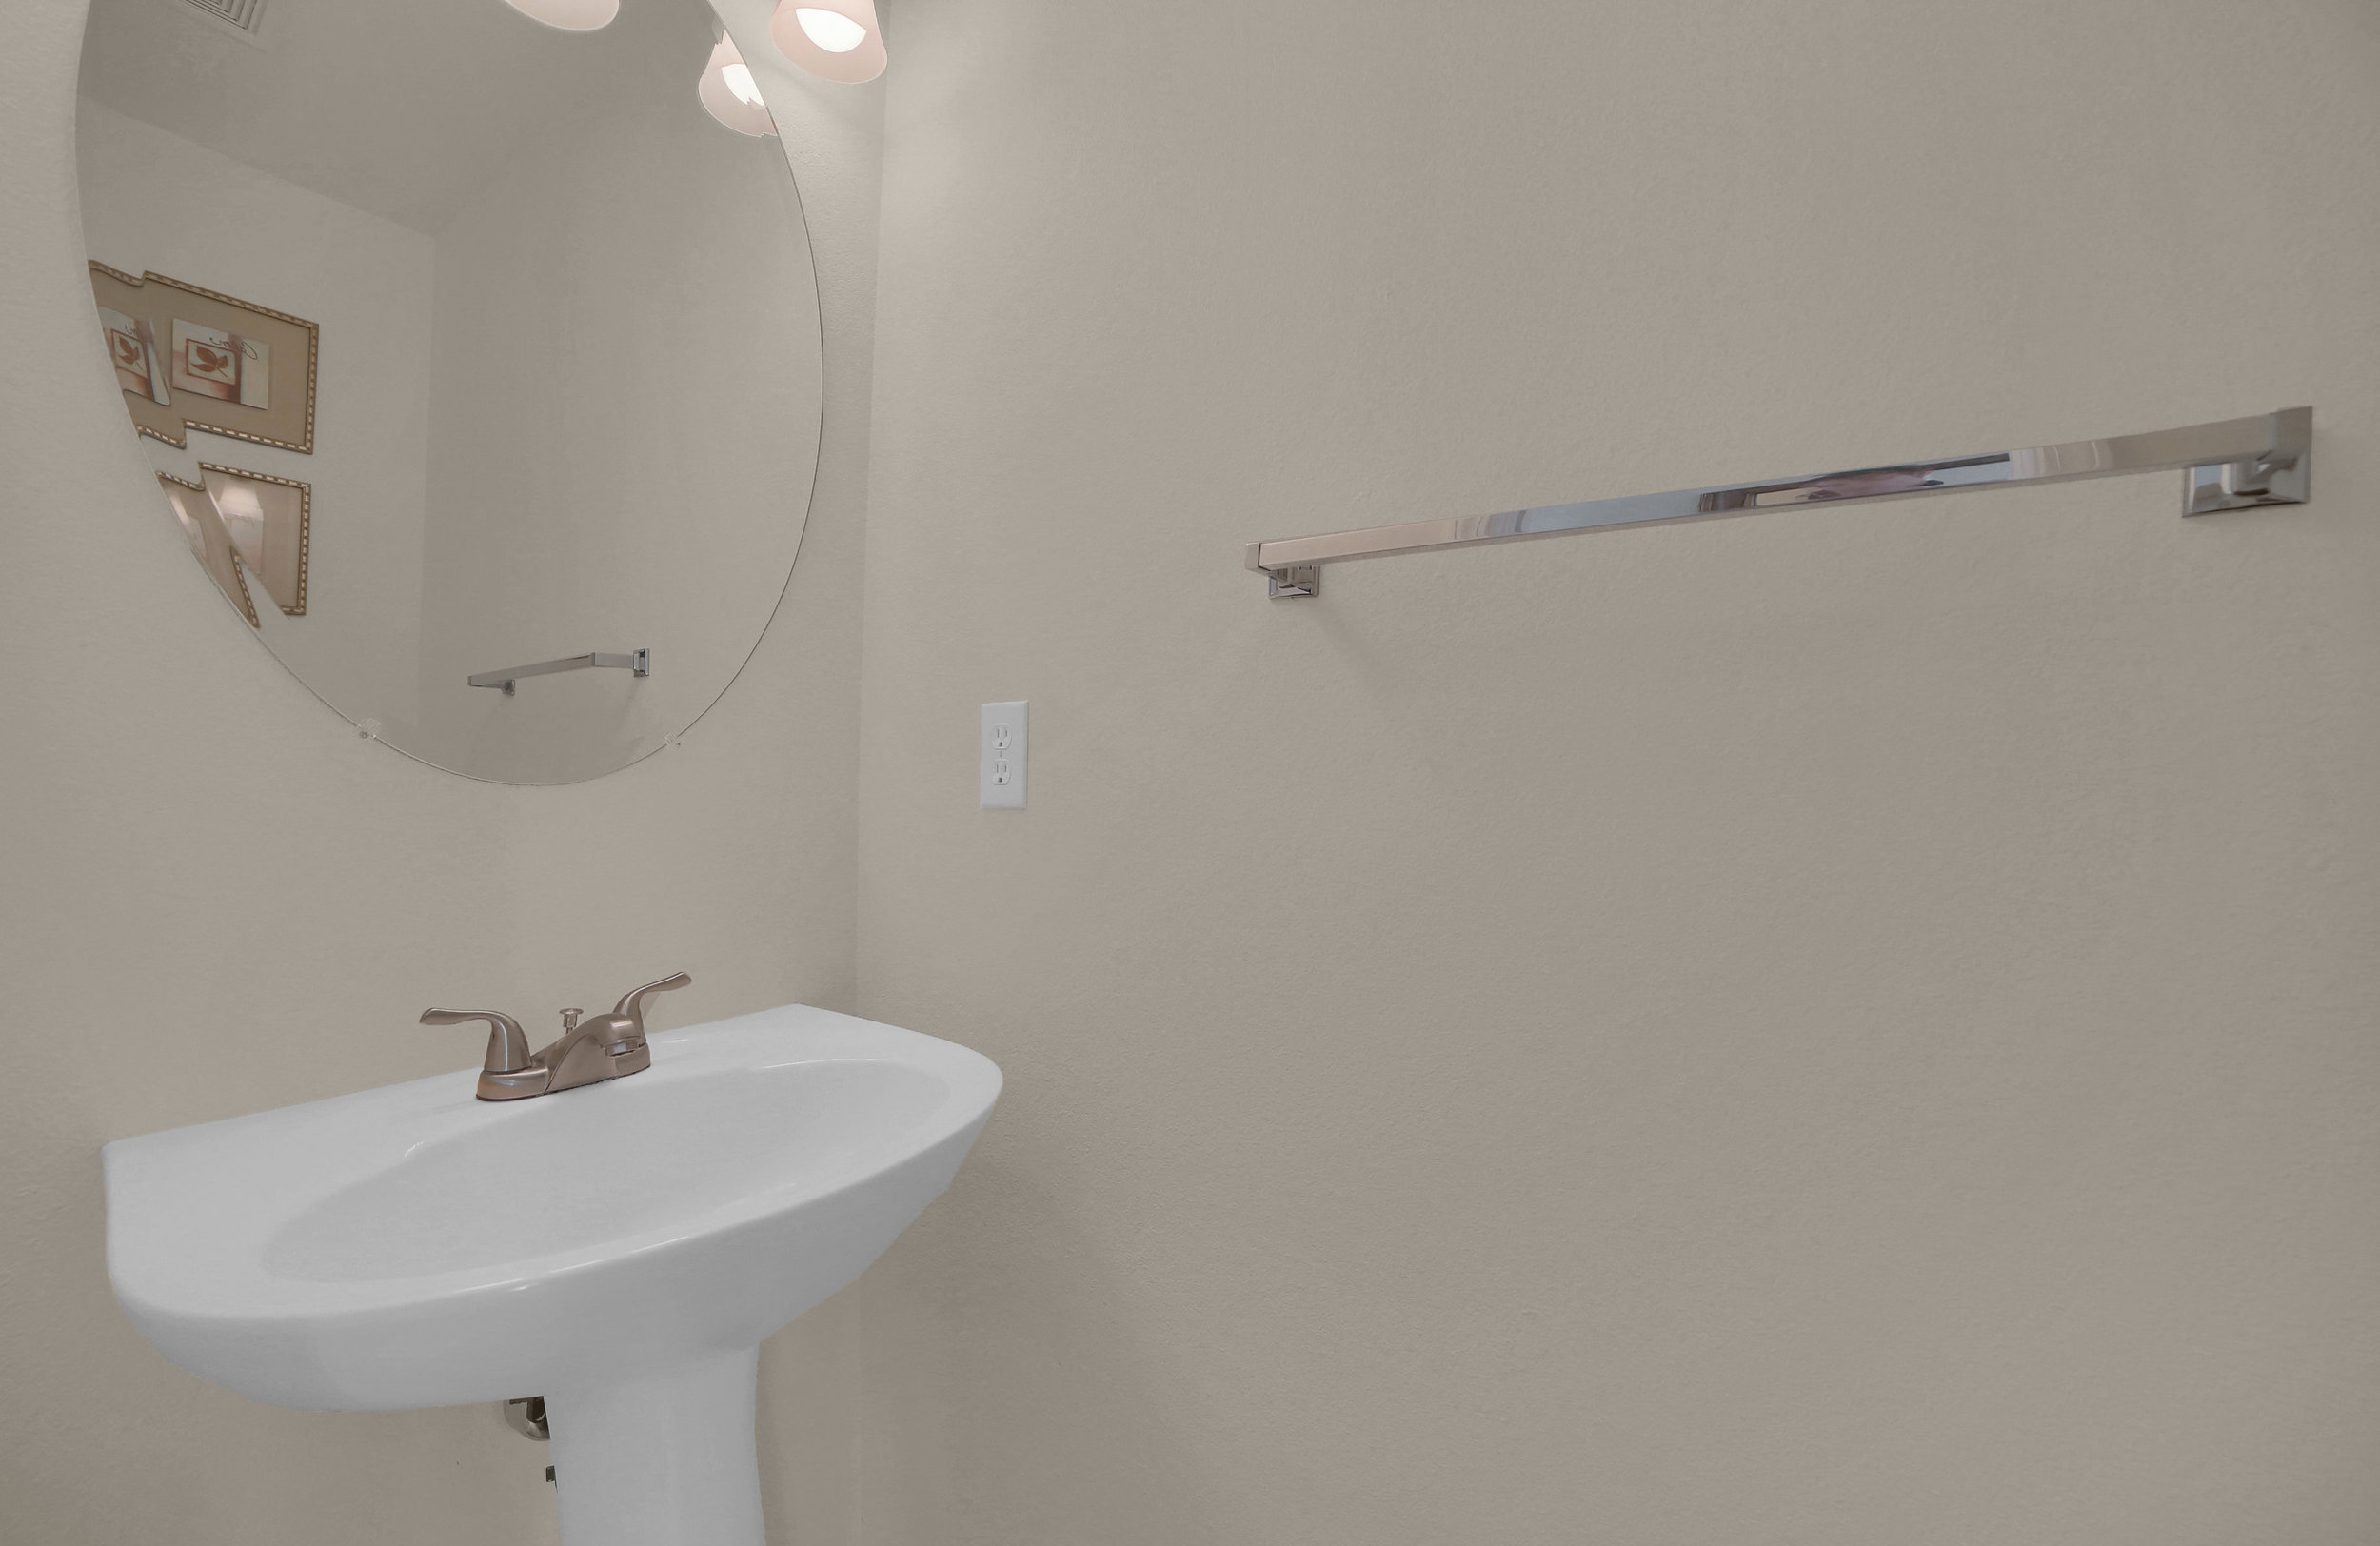 7414 Campstool Drive Colorado-print-017-015-Bathroom-3646x2369-300dpi.jpg